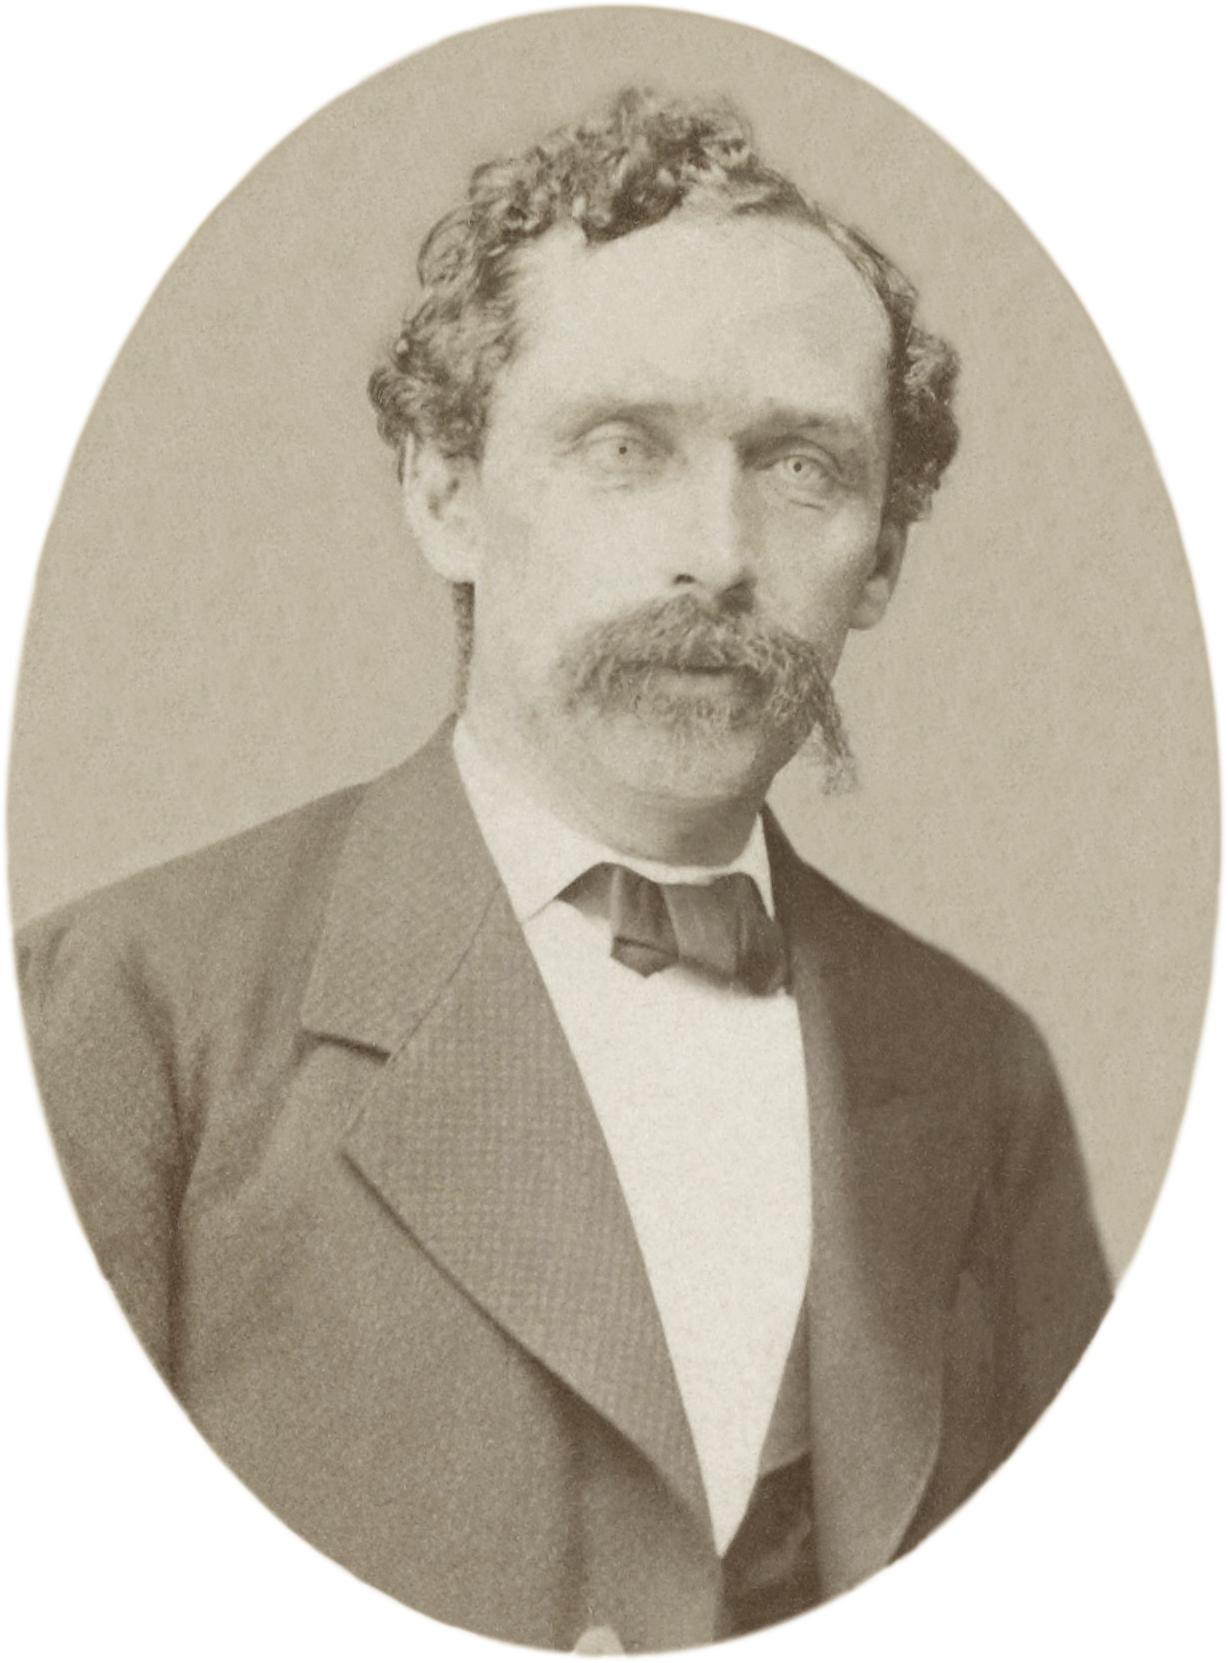 Depiction of Gustav Nachtigal